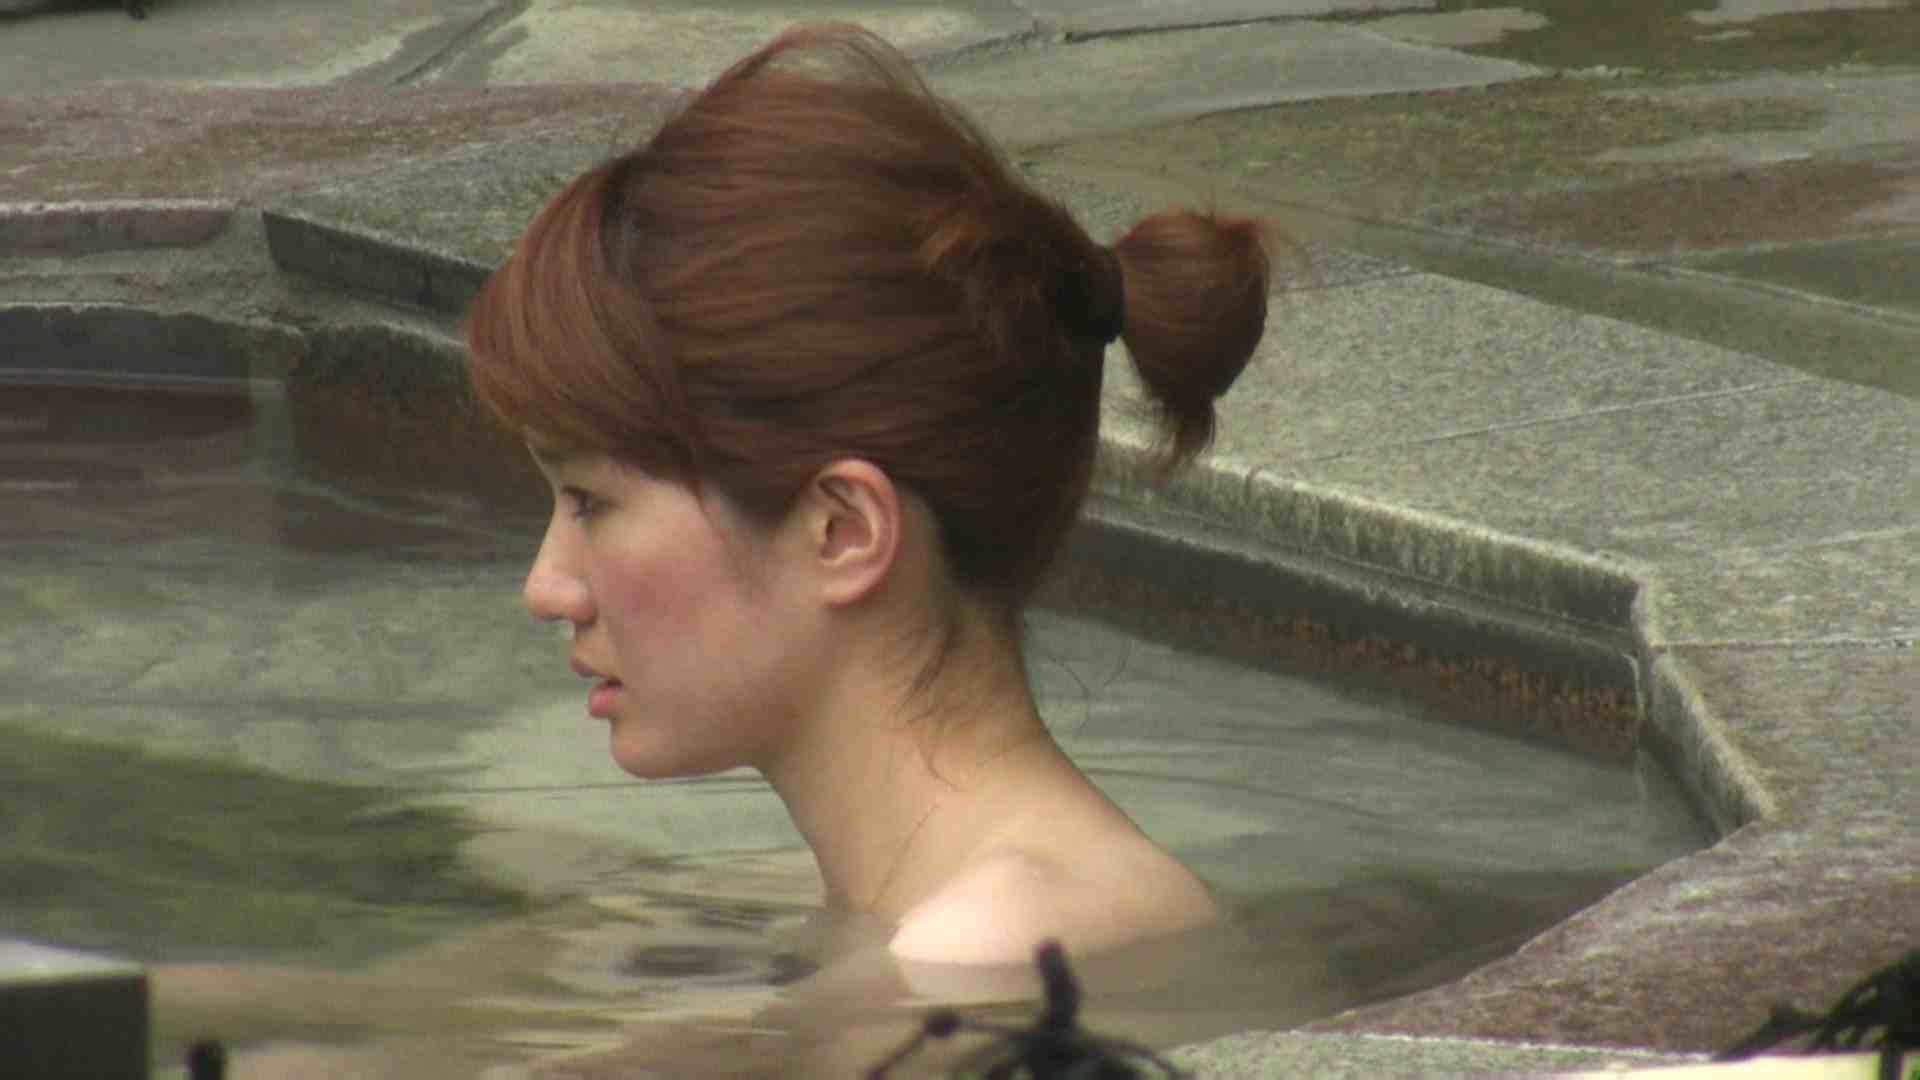 Aquaな露天風呂Vol.110 エッチな盗撮 のぞき動画キャプチャ 89pic 31